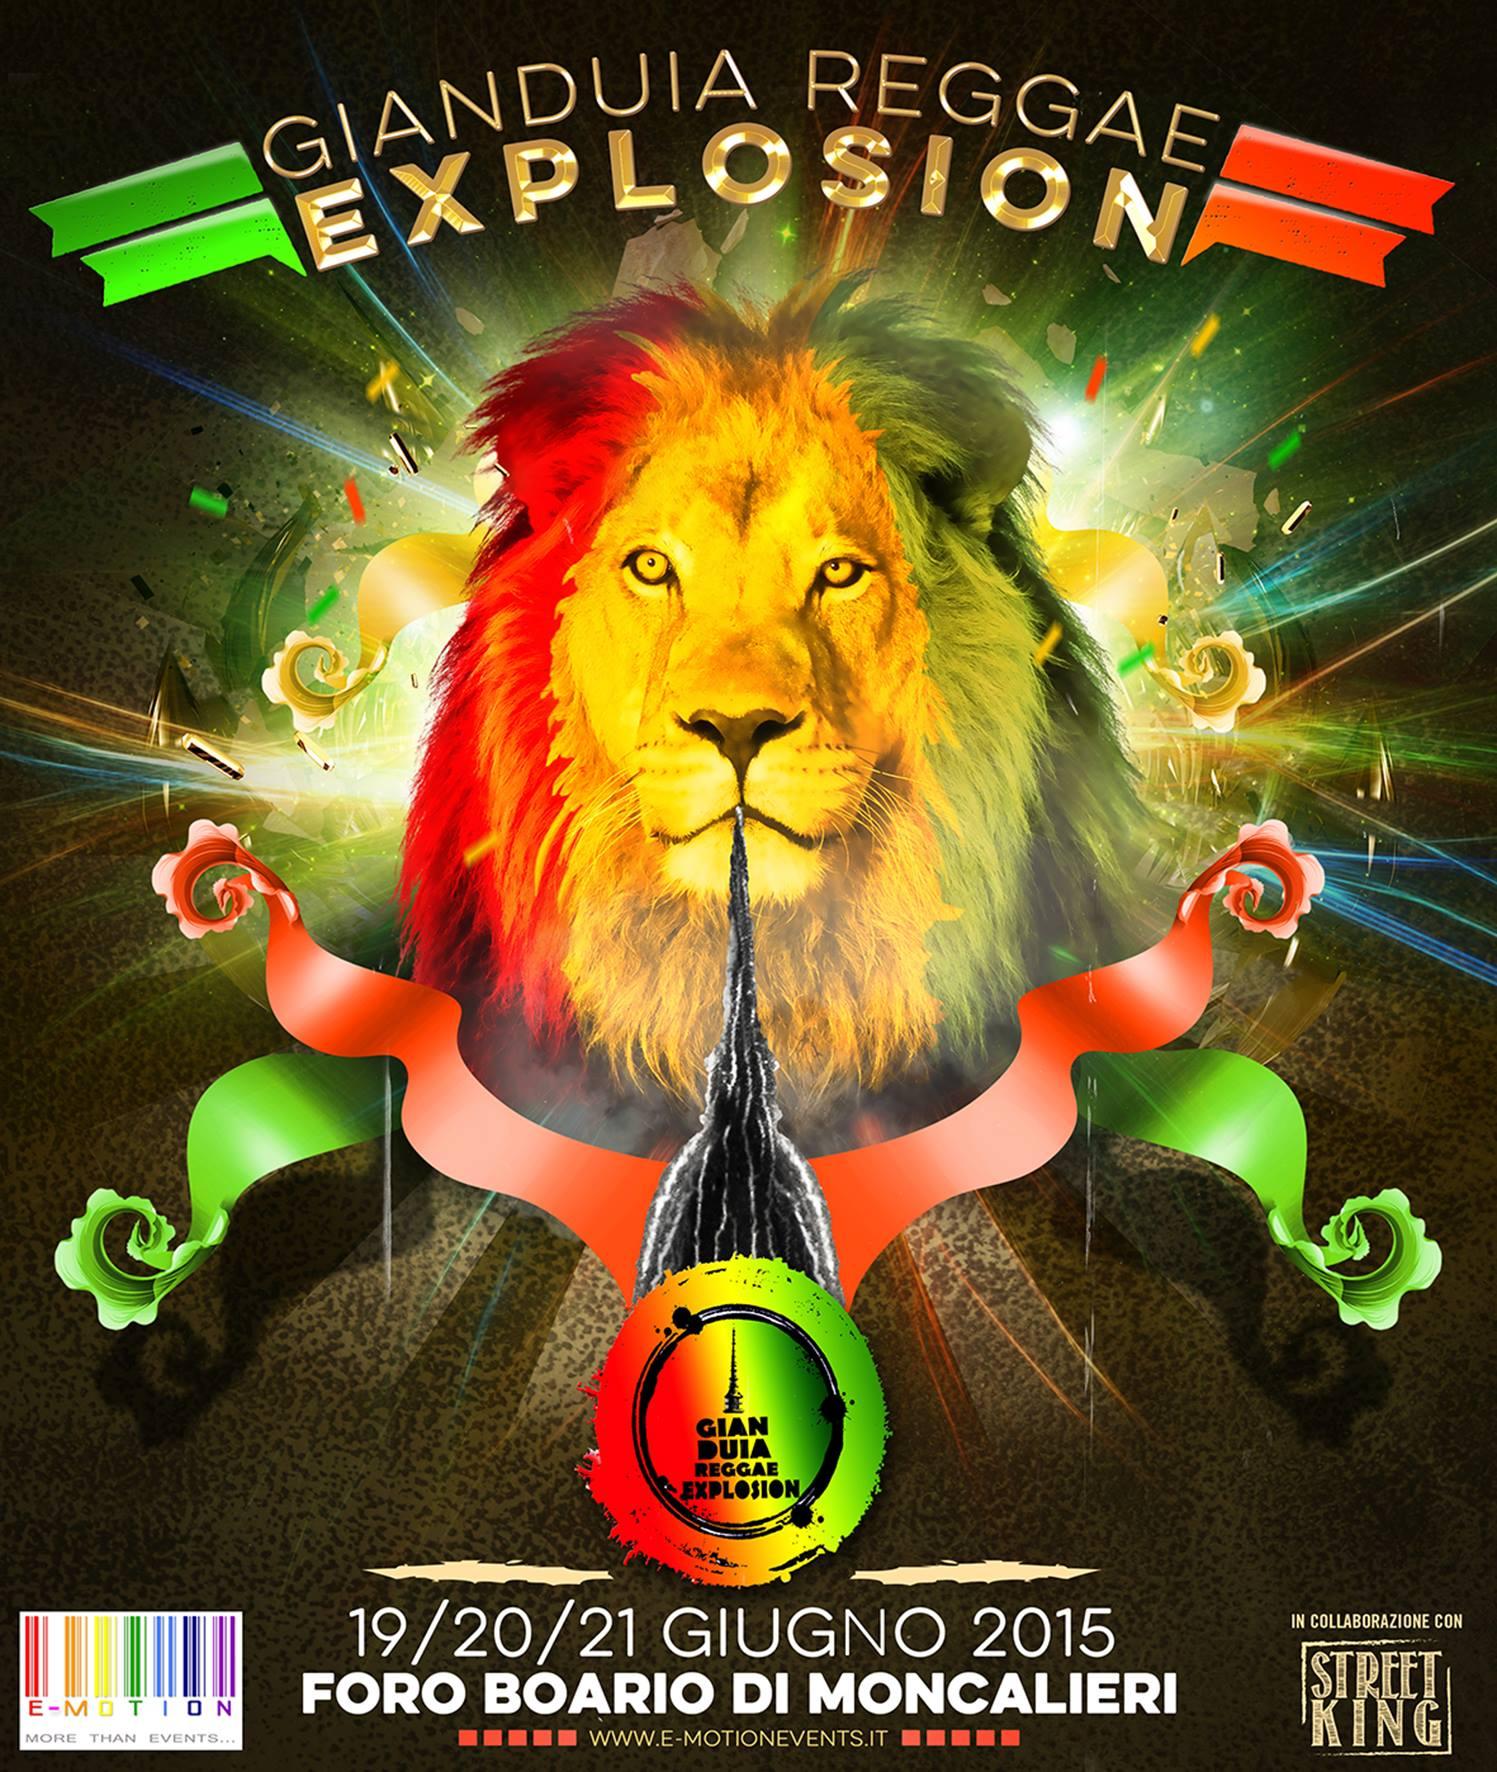 GIANDUIA REGGAE EXPLOSION 2015